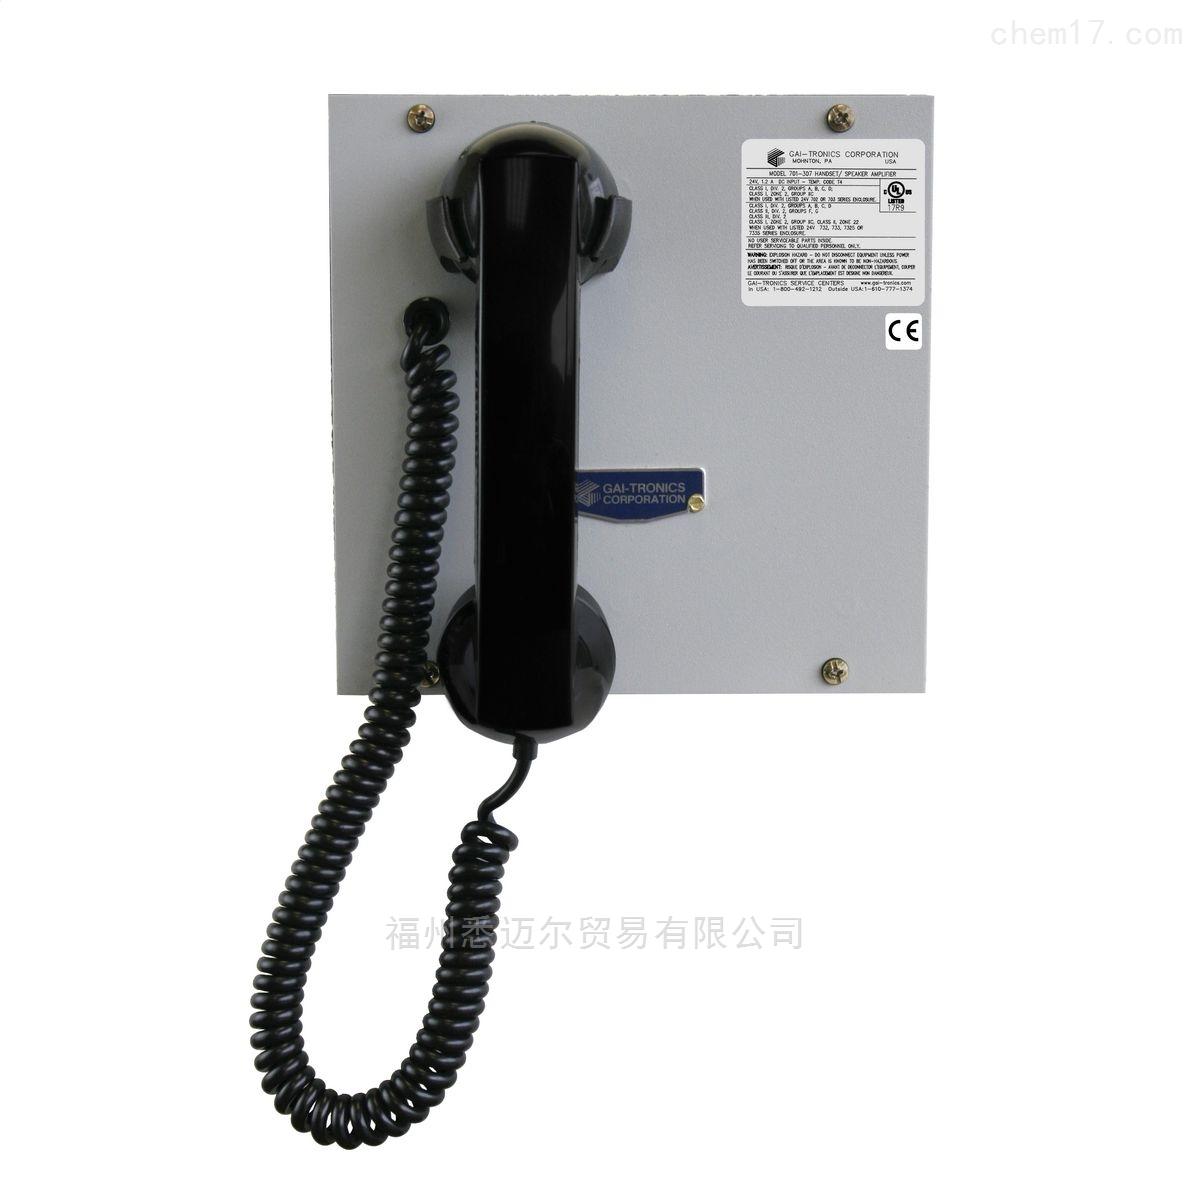 FHF防爆电话机